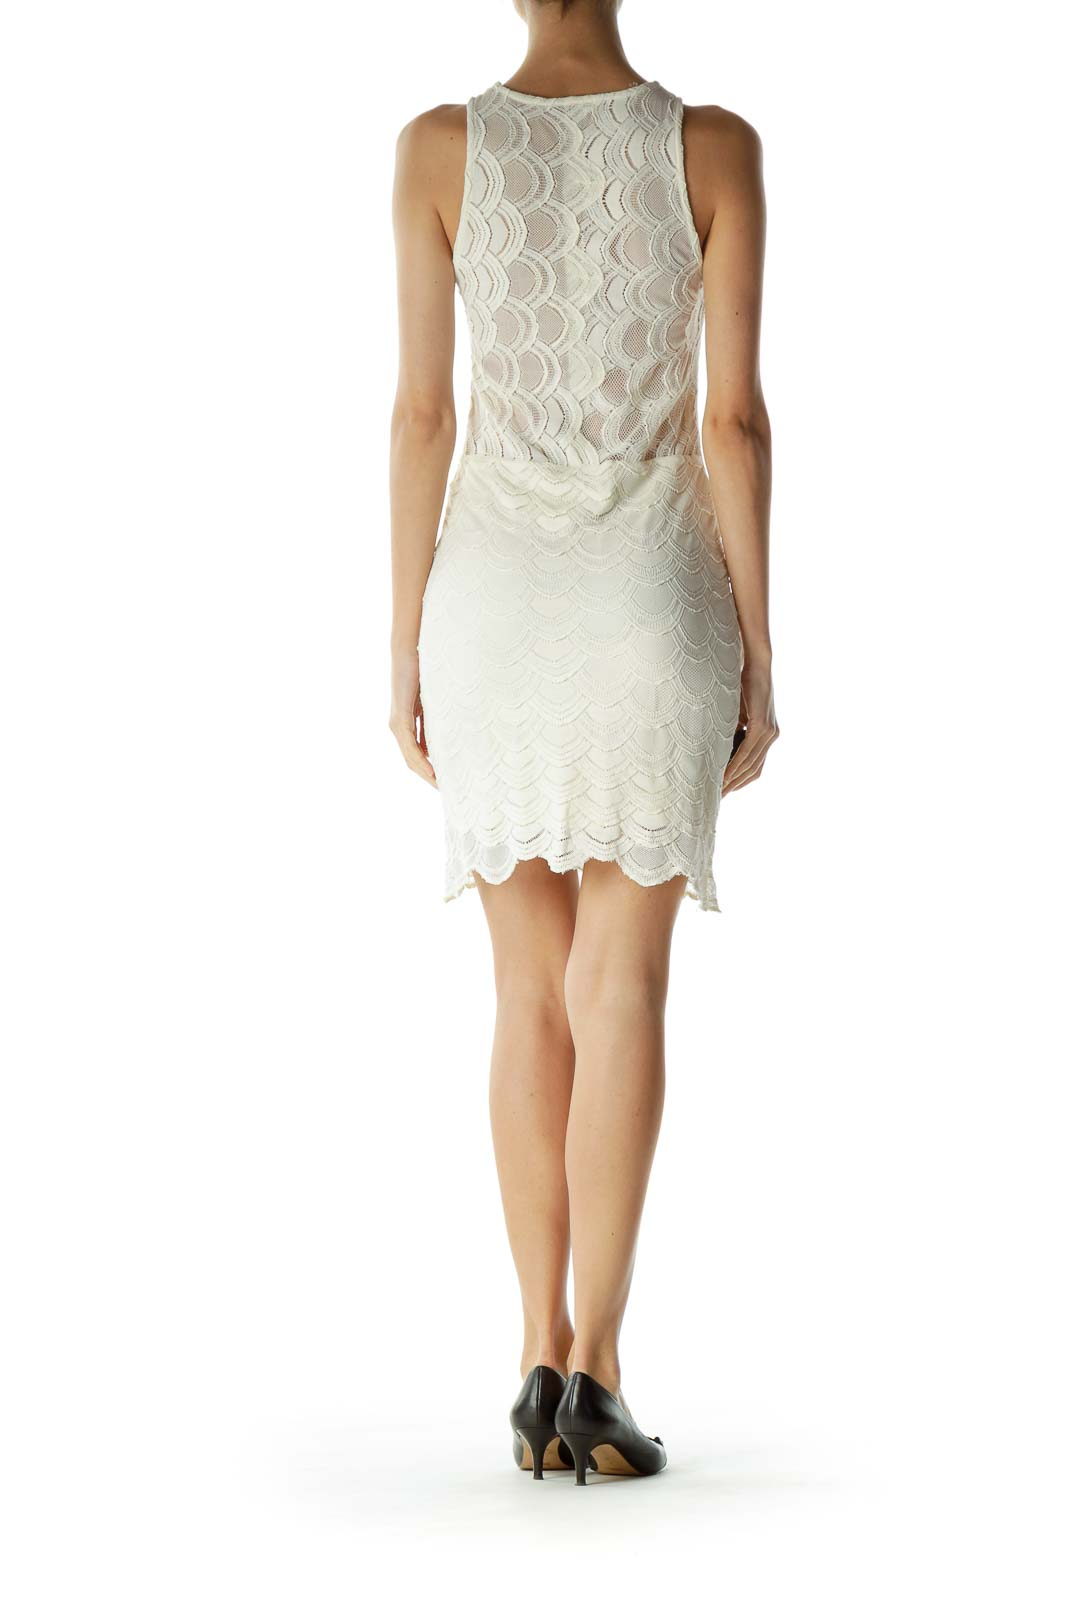 Cream Crocheted Scalloped Day Dress